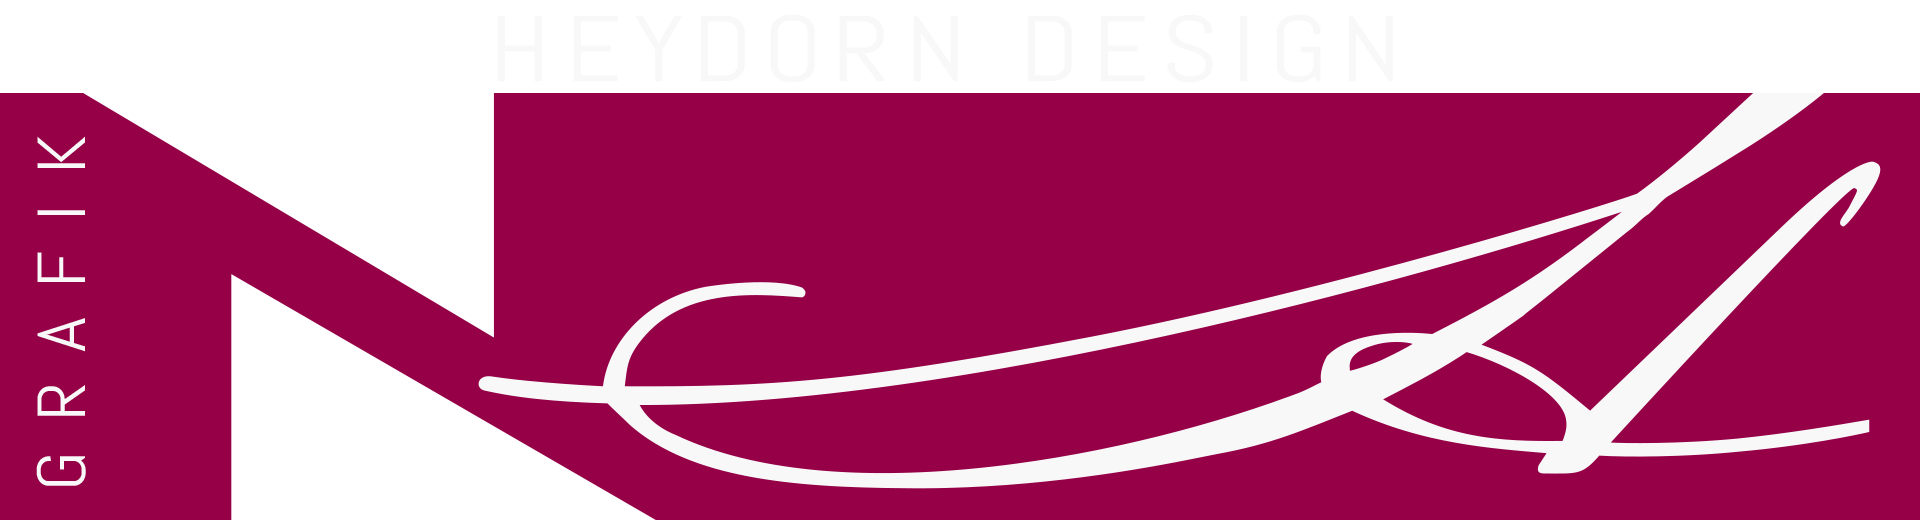 HEYDORN DESIGN